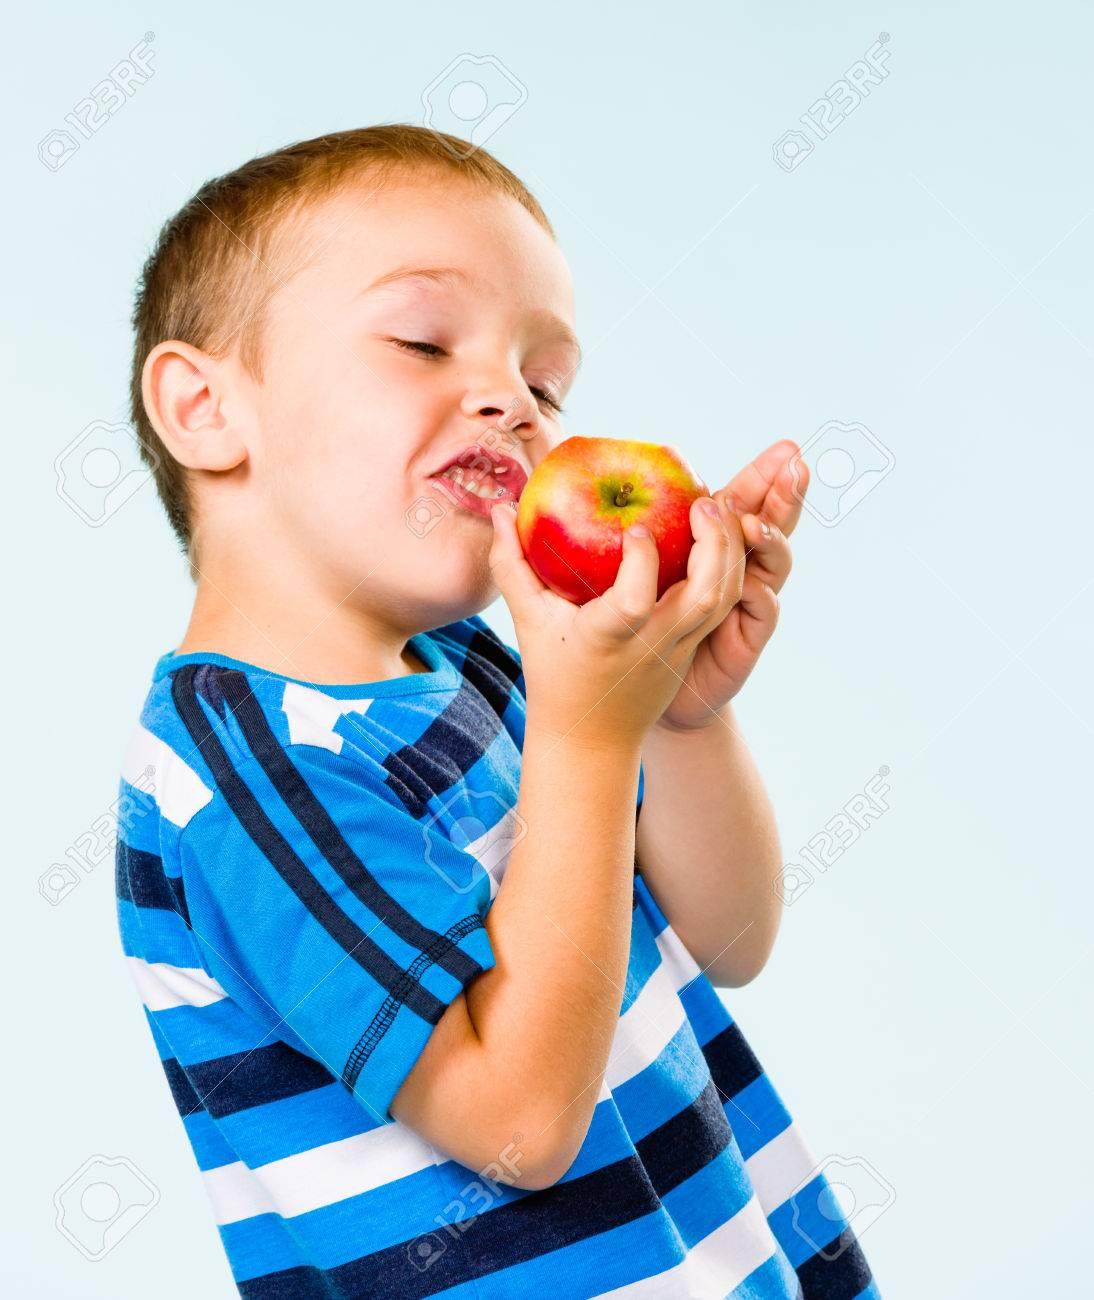 Little boy on striped t-shirt eating apple, studio shot and light blue background Stock Photo - 22442592